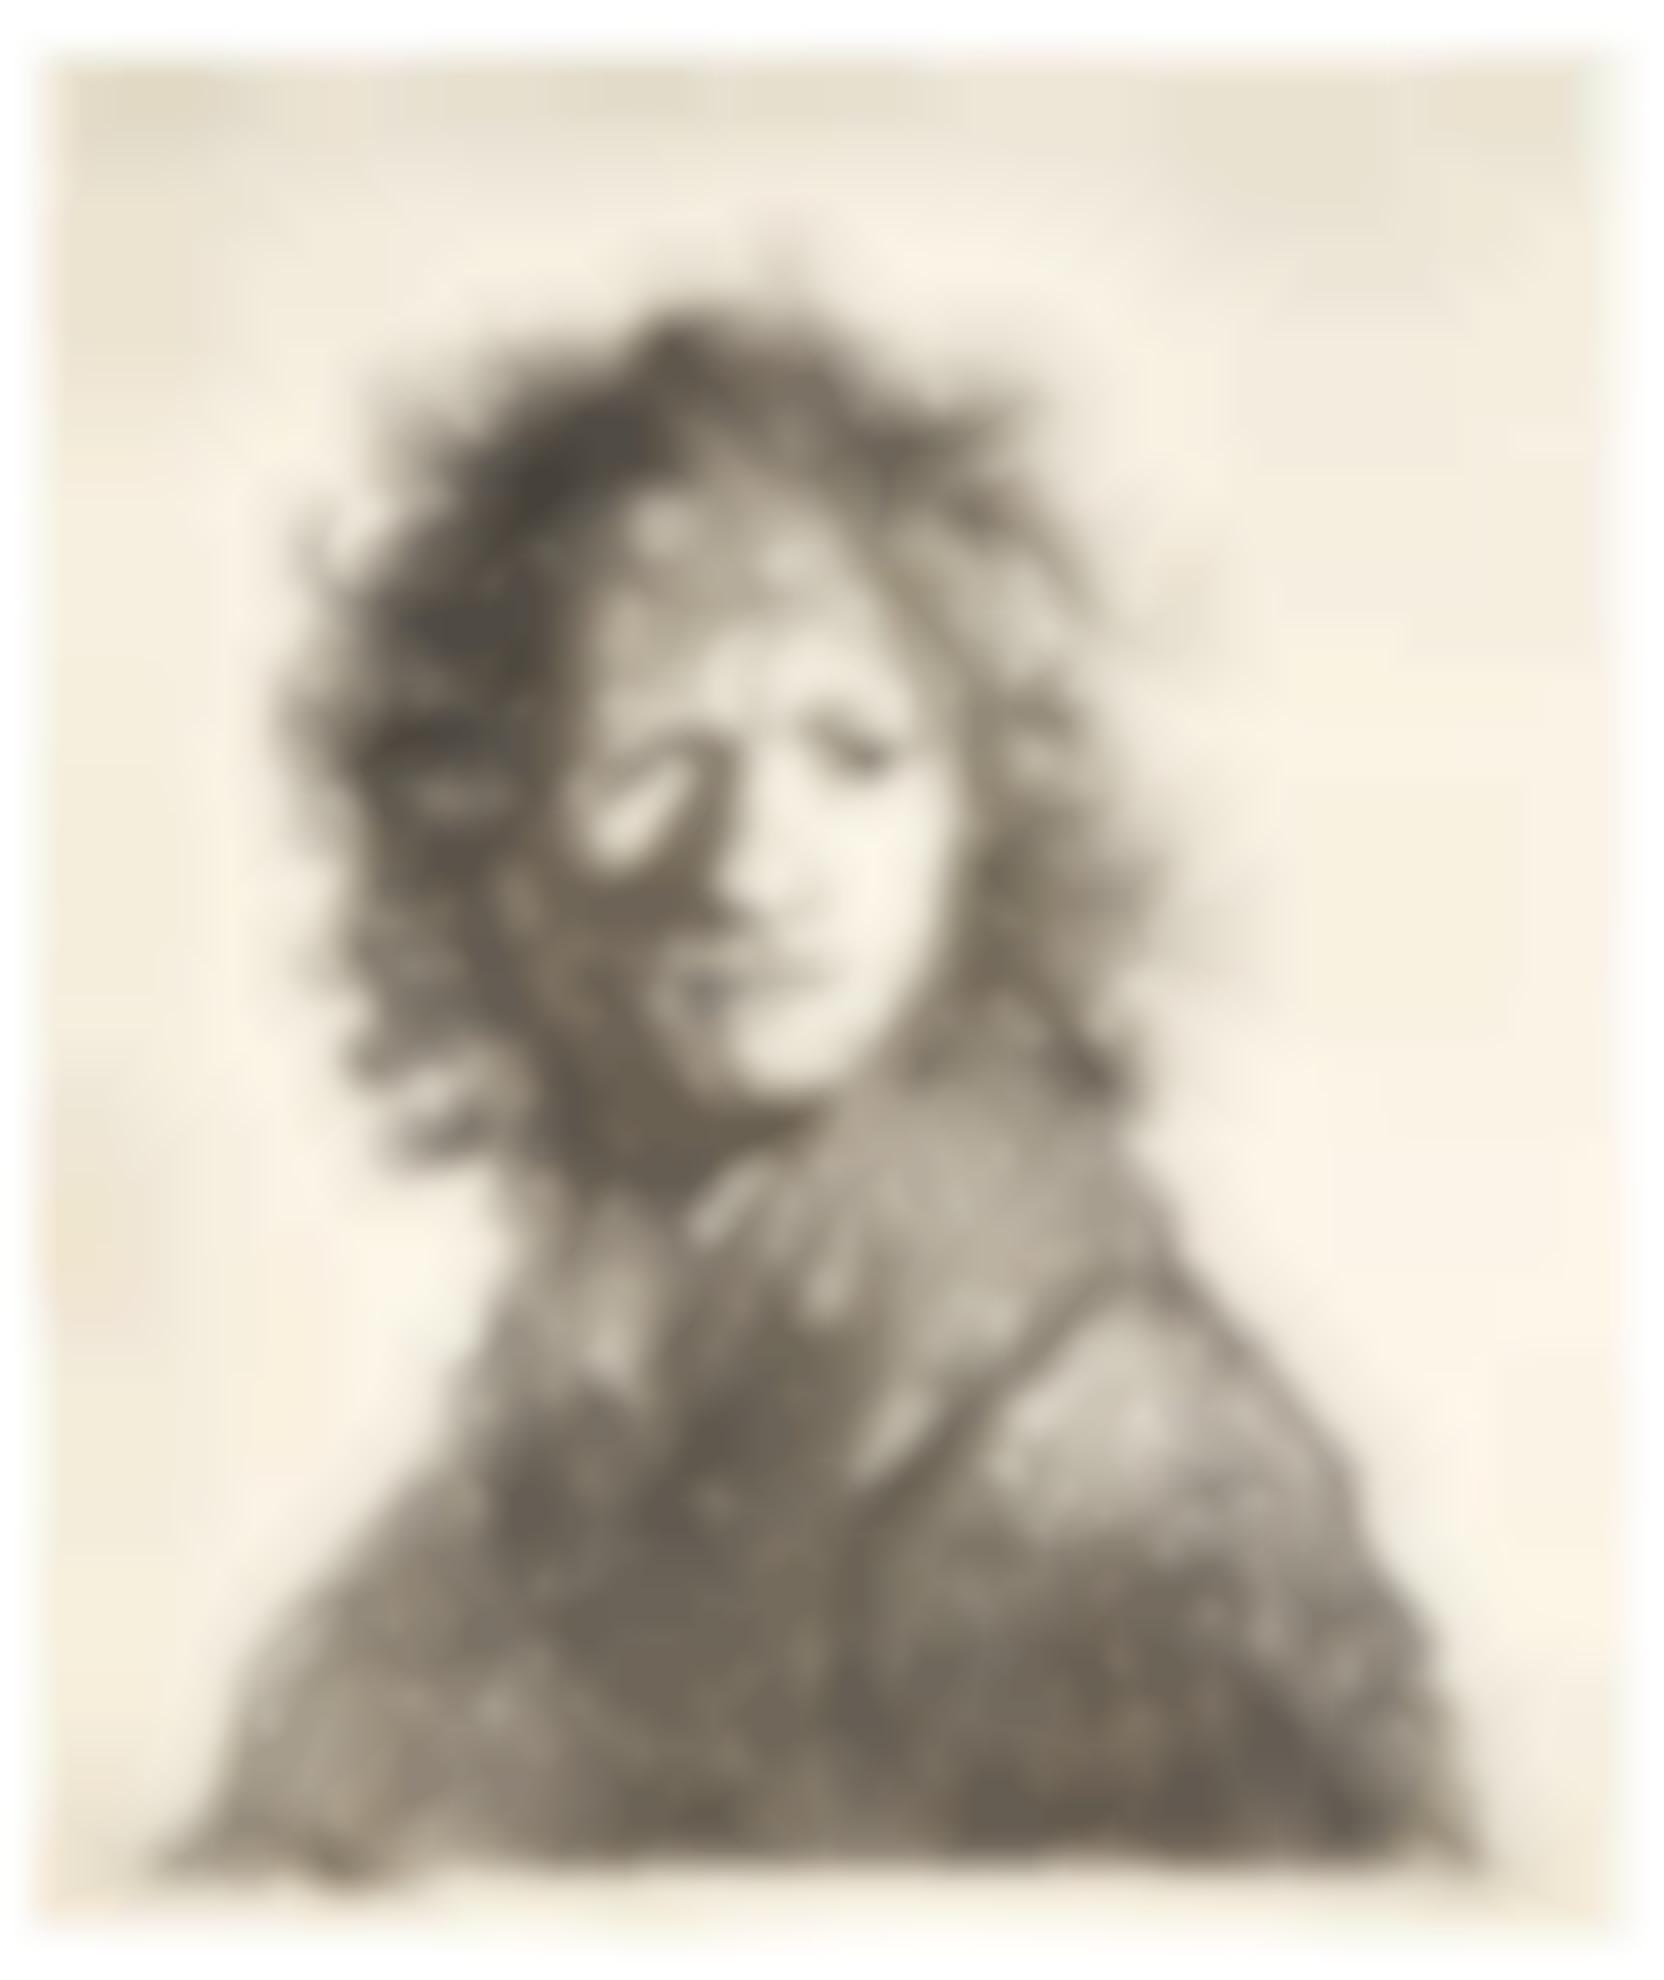 Rembrandt van Rijn-Self-Portrait, Frowning: Bust (B., Holl. 10; New Holl. 68; H. 30)-1630